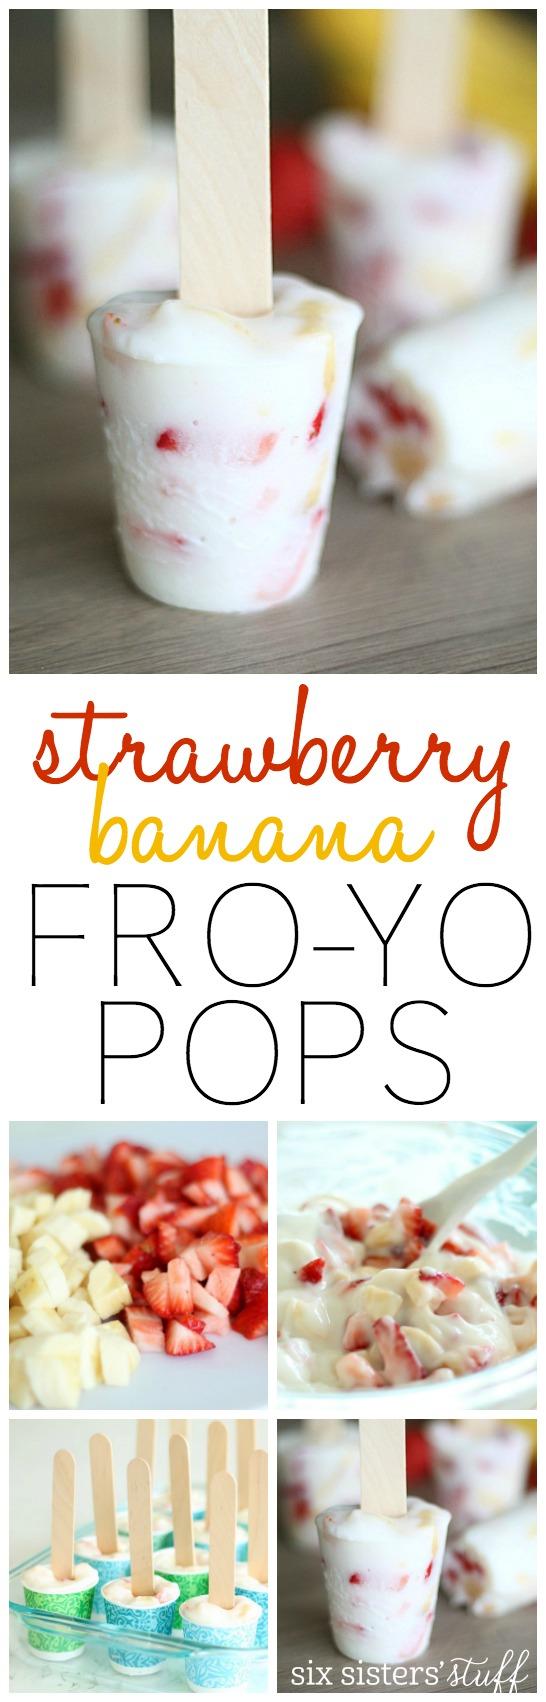 Strawberry Banana Frozen Yogurt Pops from SixSistersStuff.com